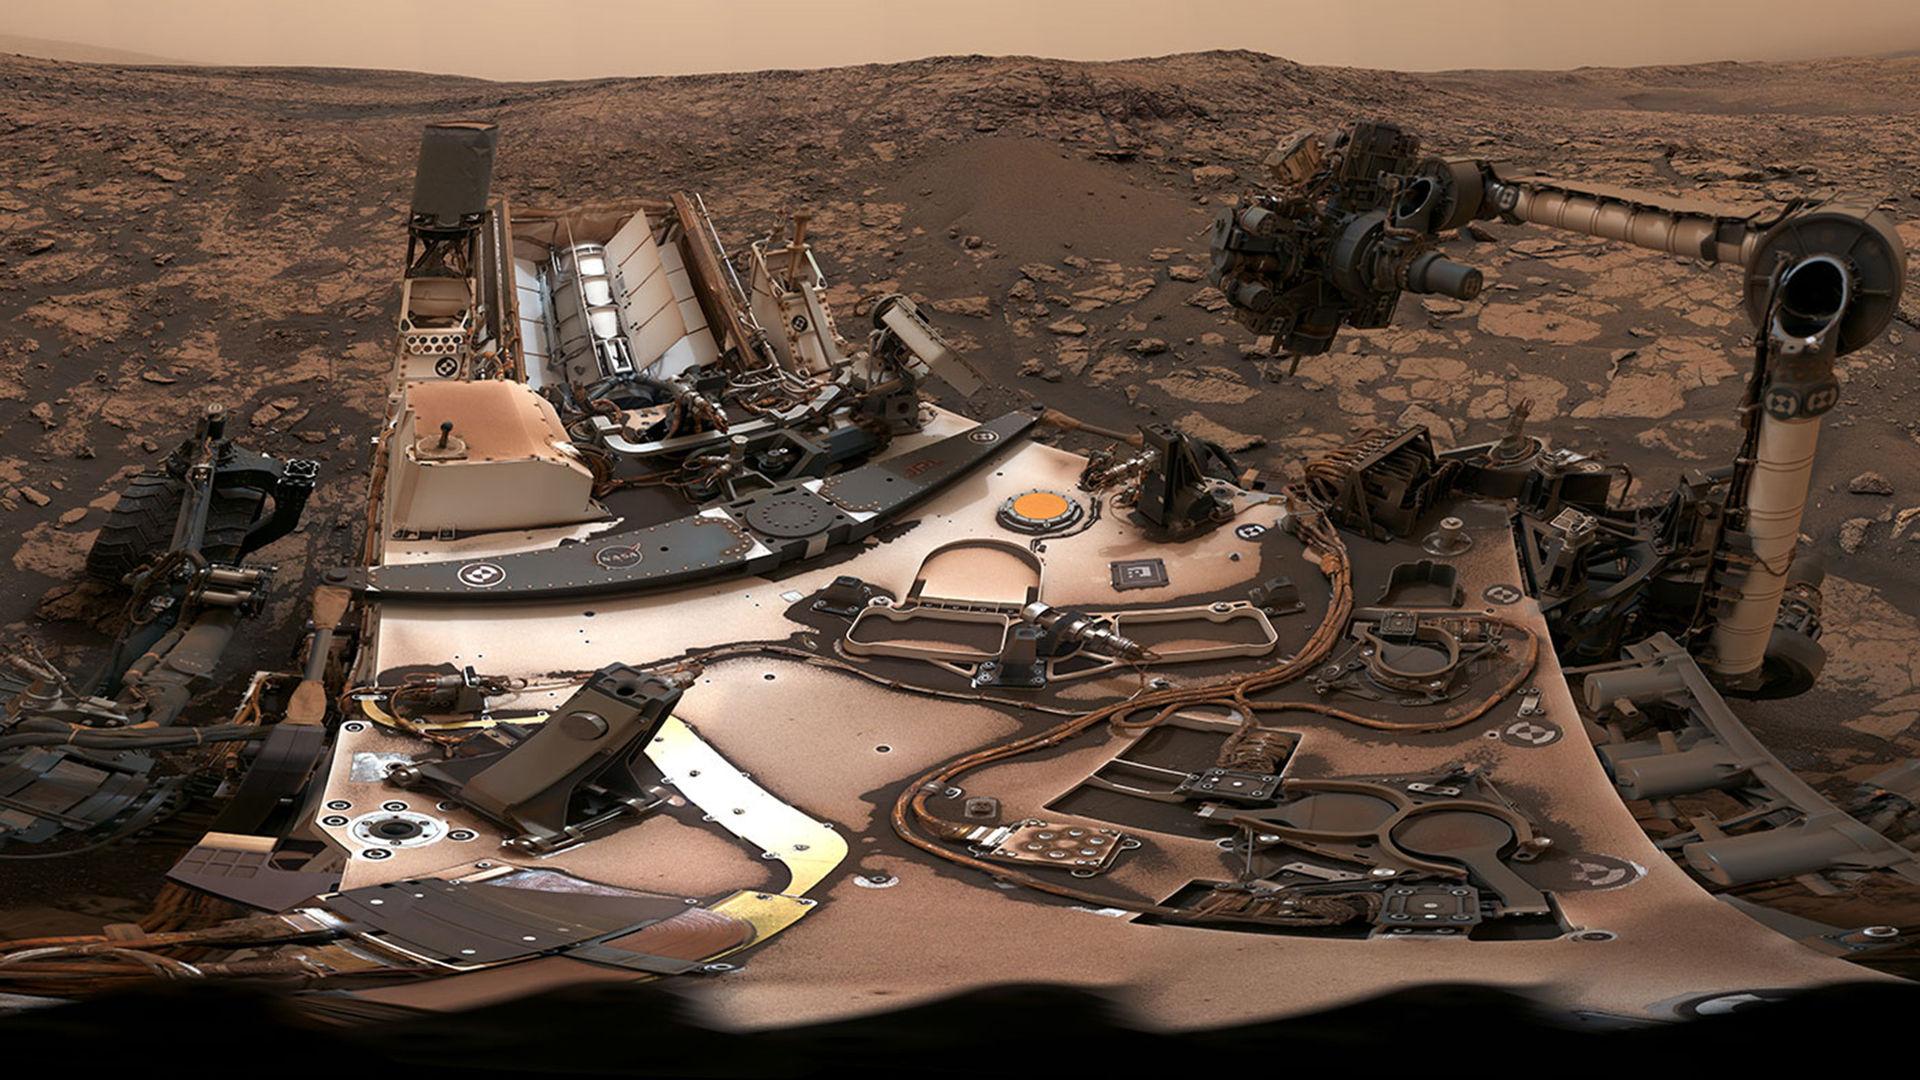 Curiosity har tagit ytterligare en cool selfie på Mars